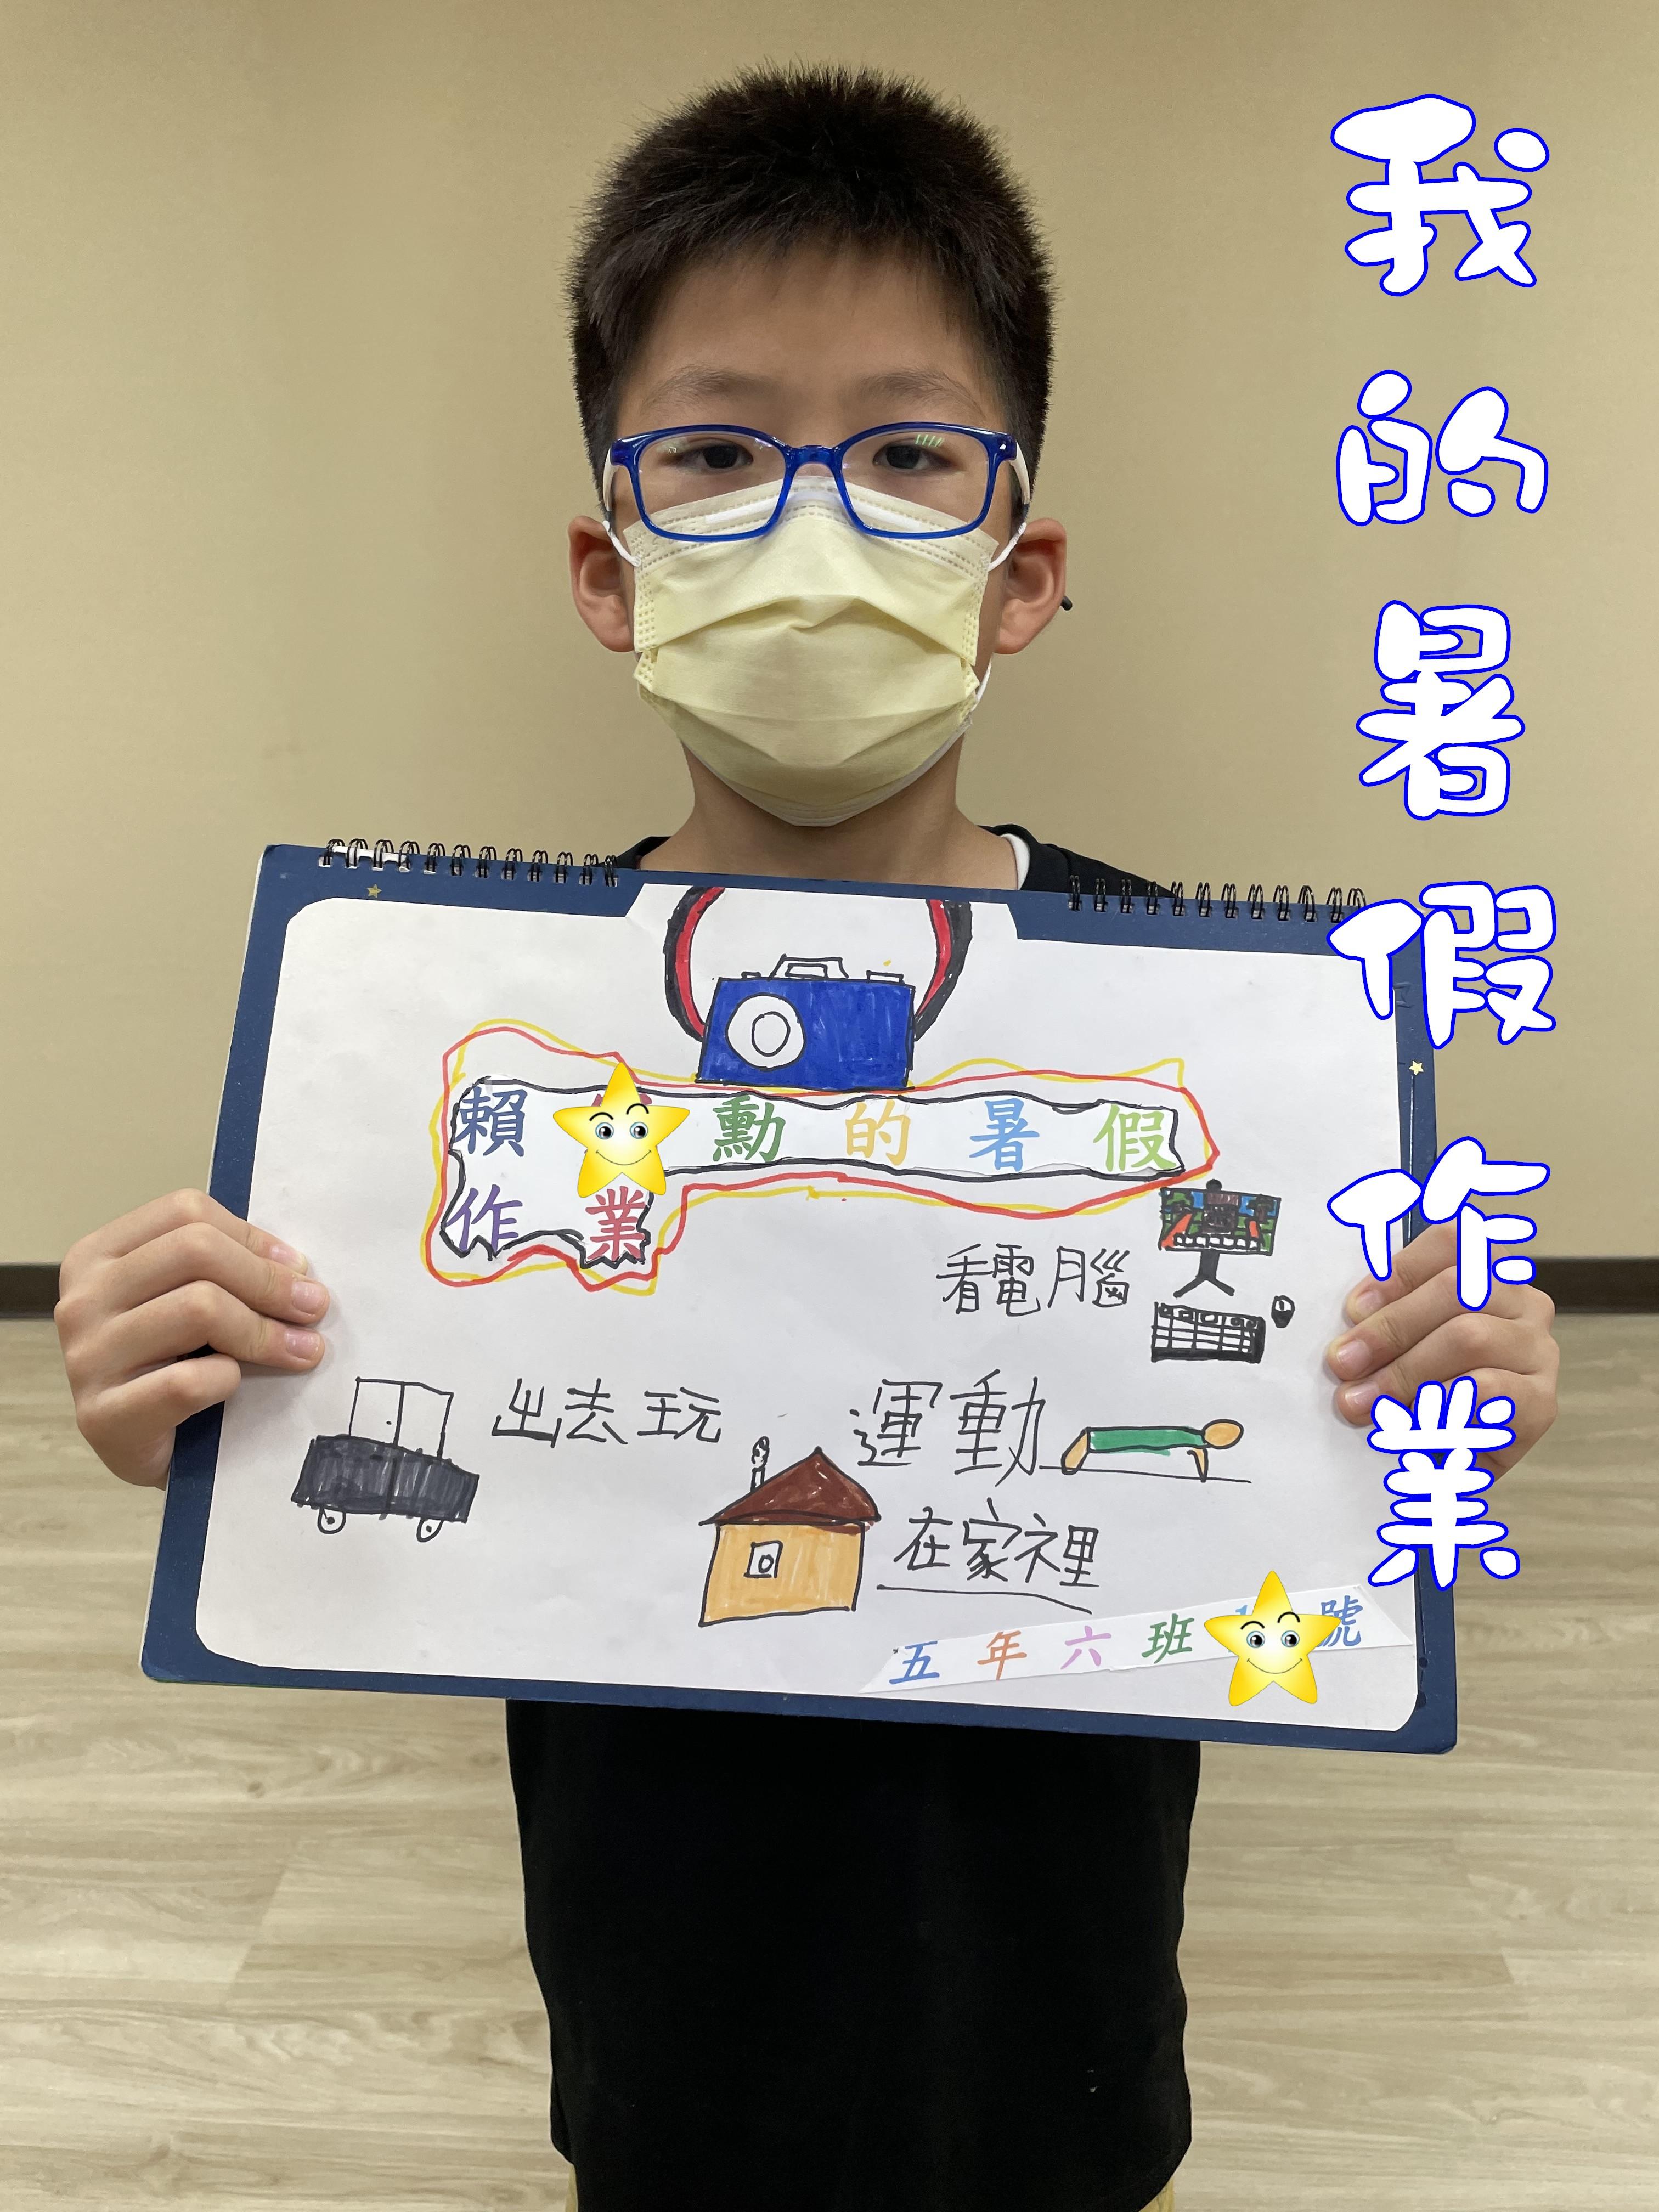 https://elem.nehs.hc.edu.tw/xoops2/uploads/tadgallery/2021_10_01/181_506賴冠勳.jpg